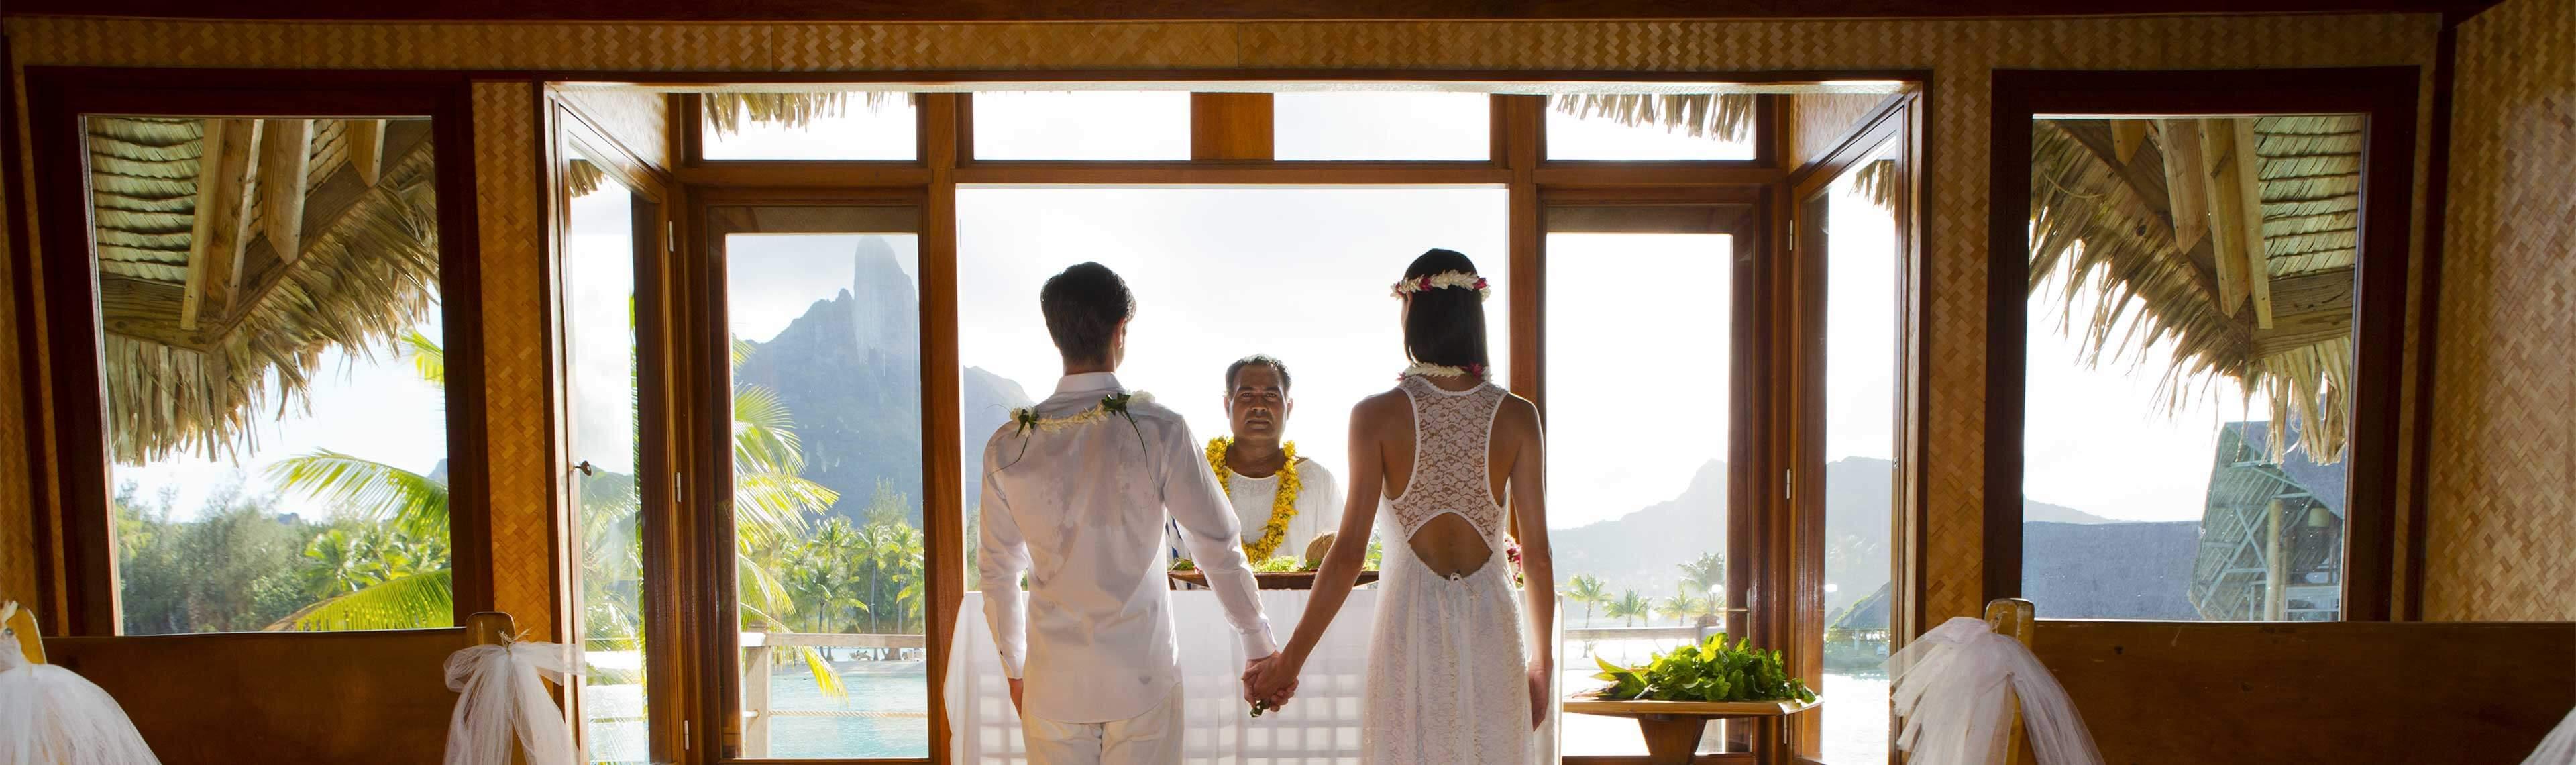 getting married tahiti